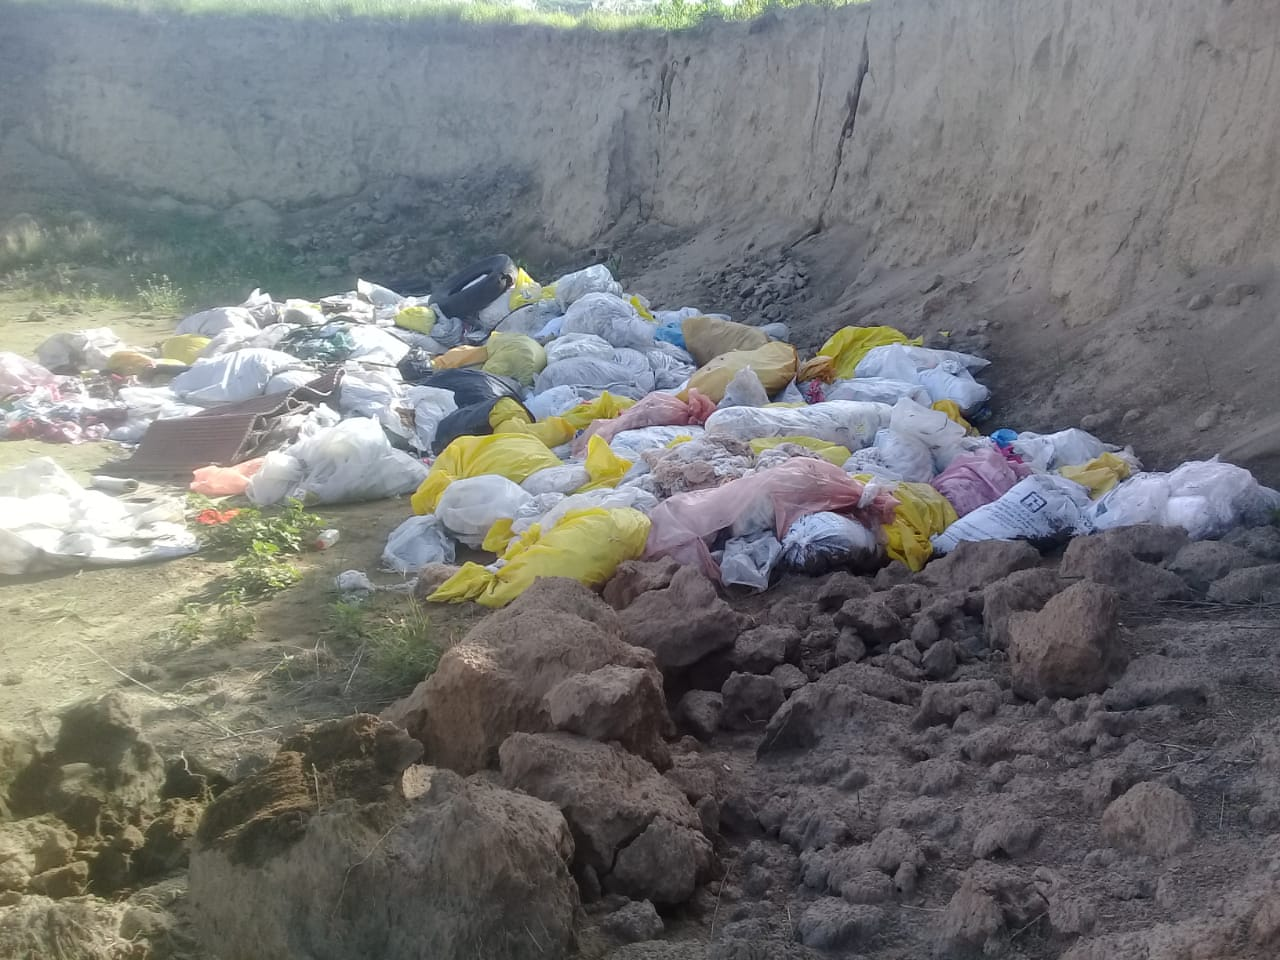 Empresas textileras usan terrenos de Texmelucan como tiraderos de desechos (Puebla)